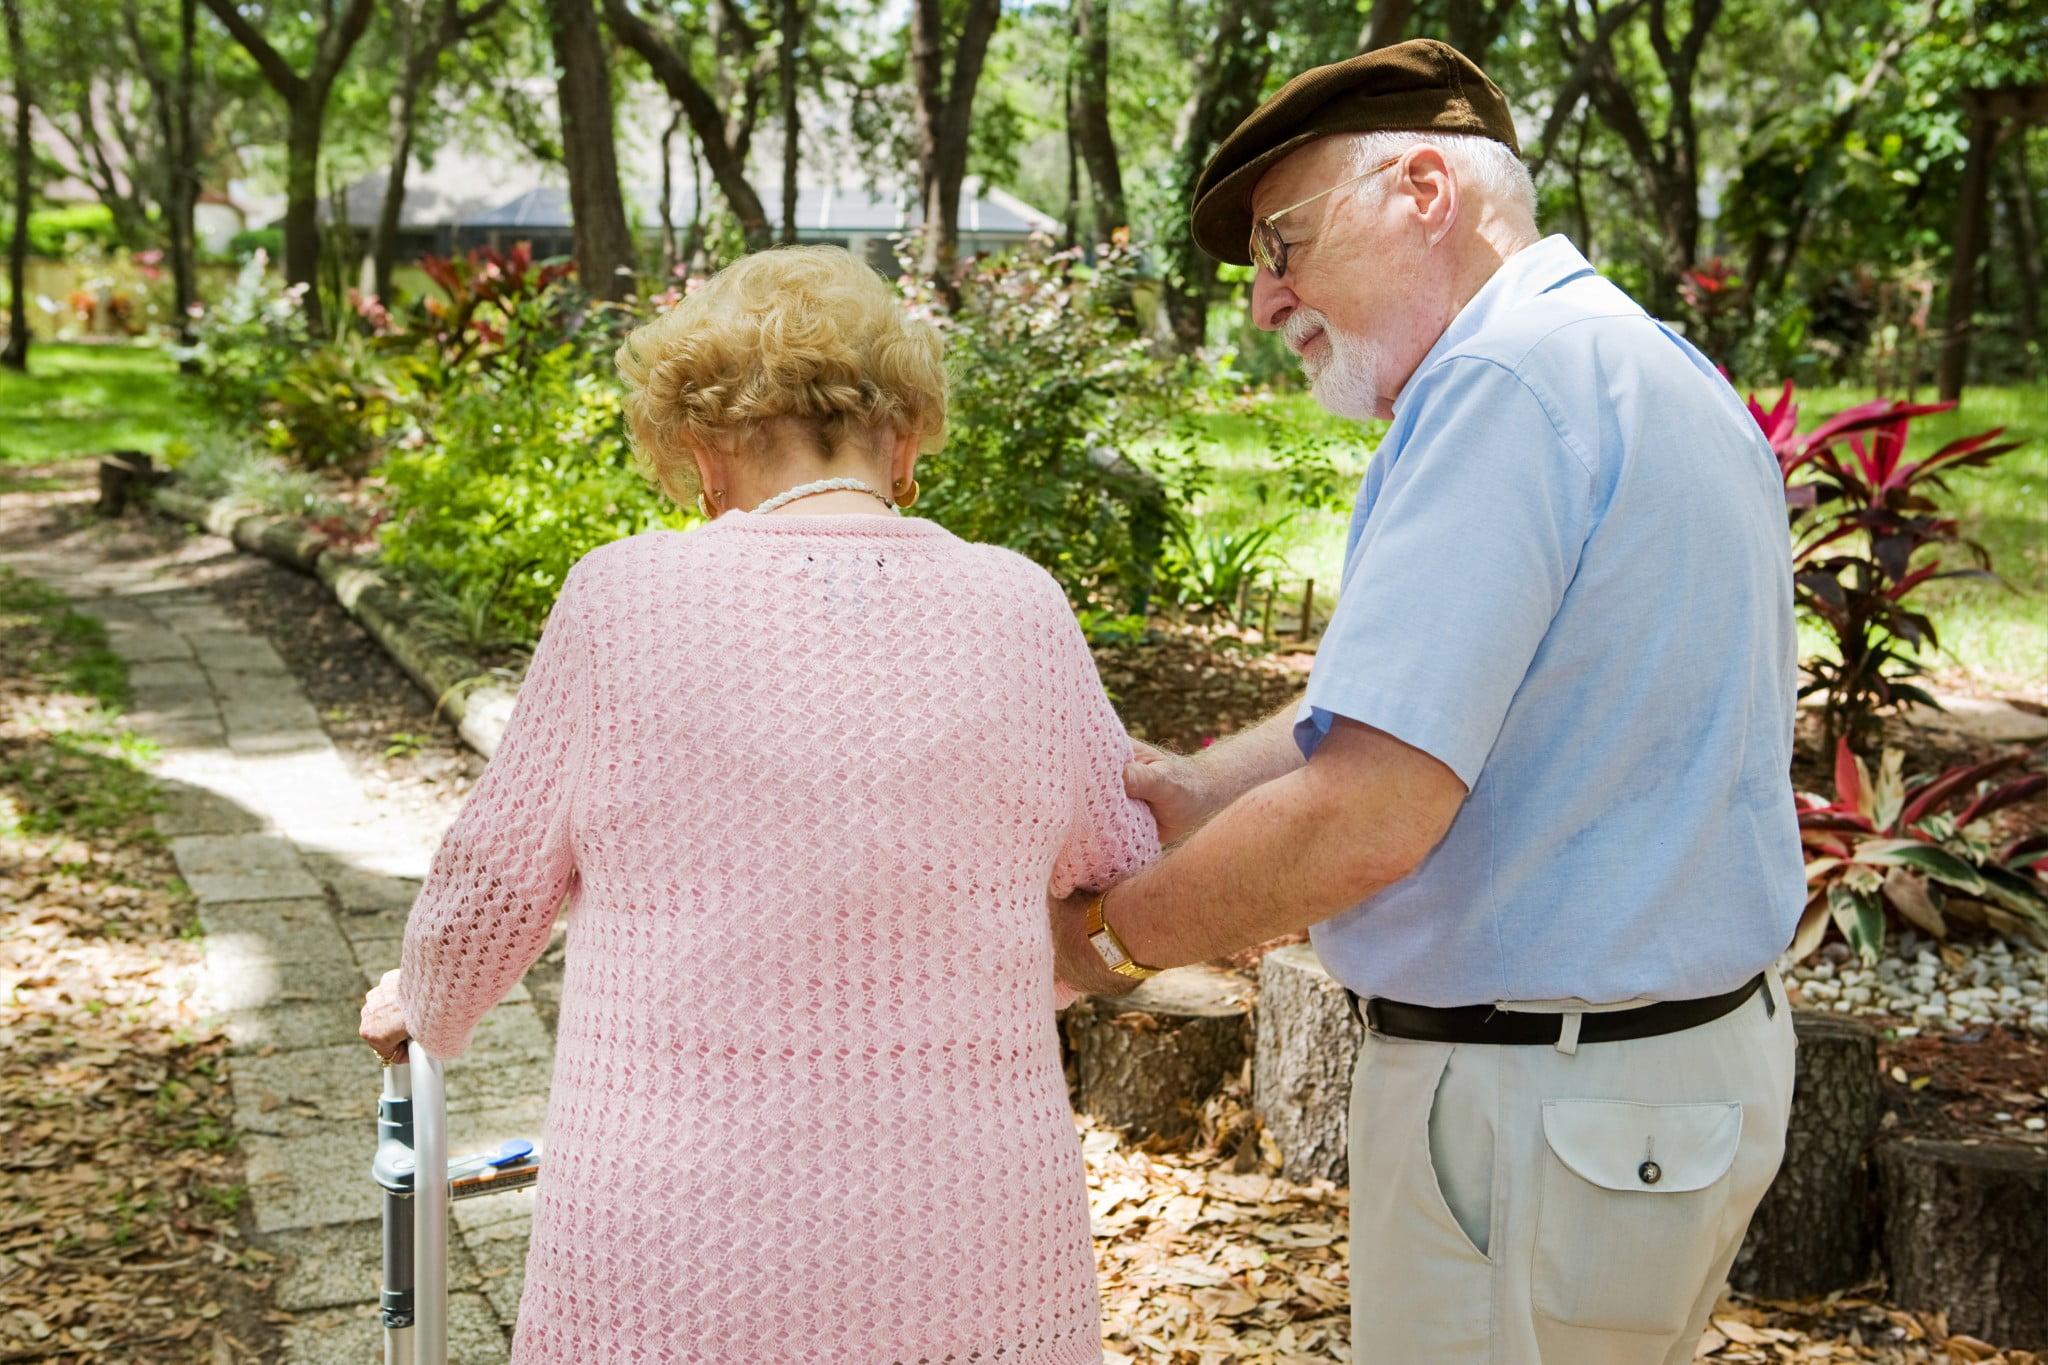 osteoporosis: frail older woman helped along by older man